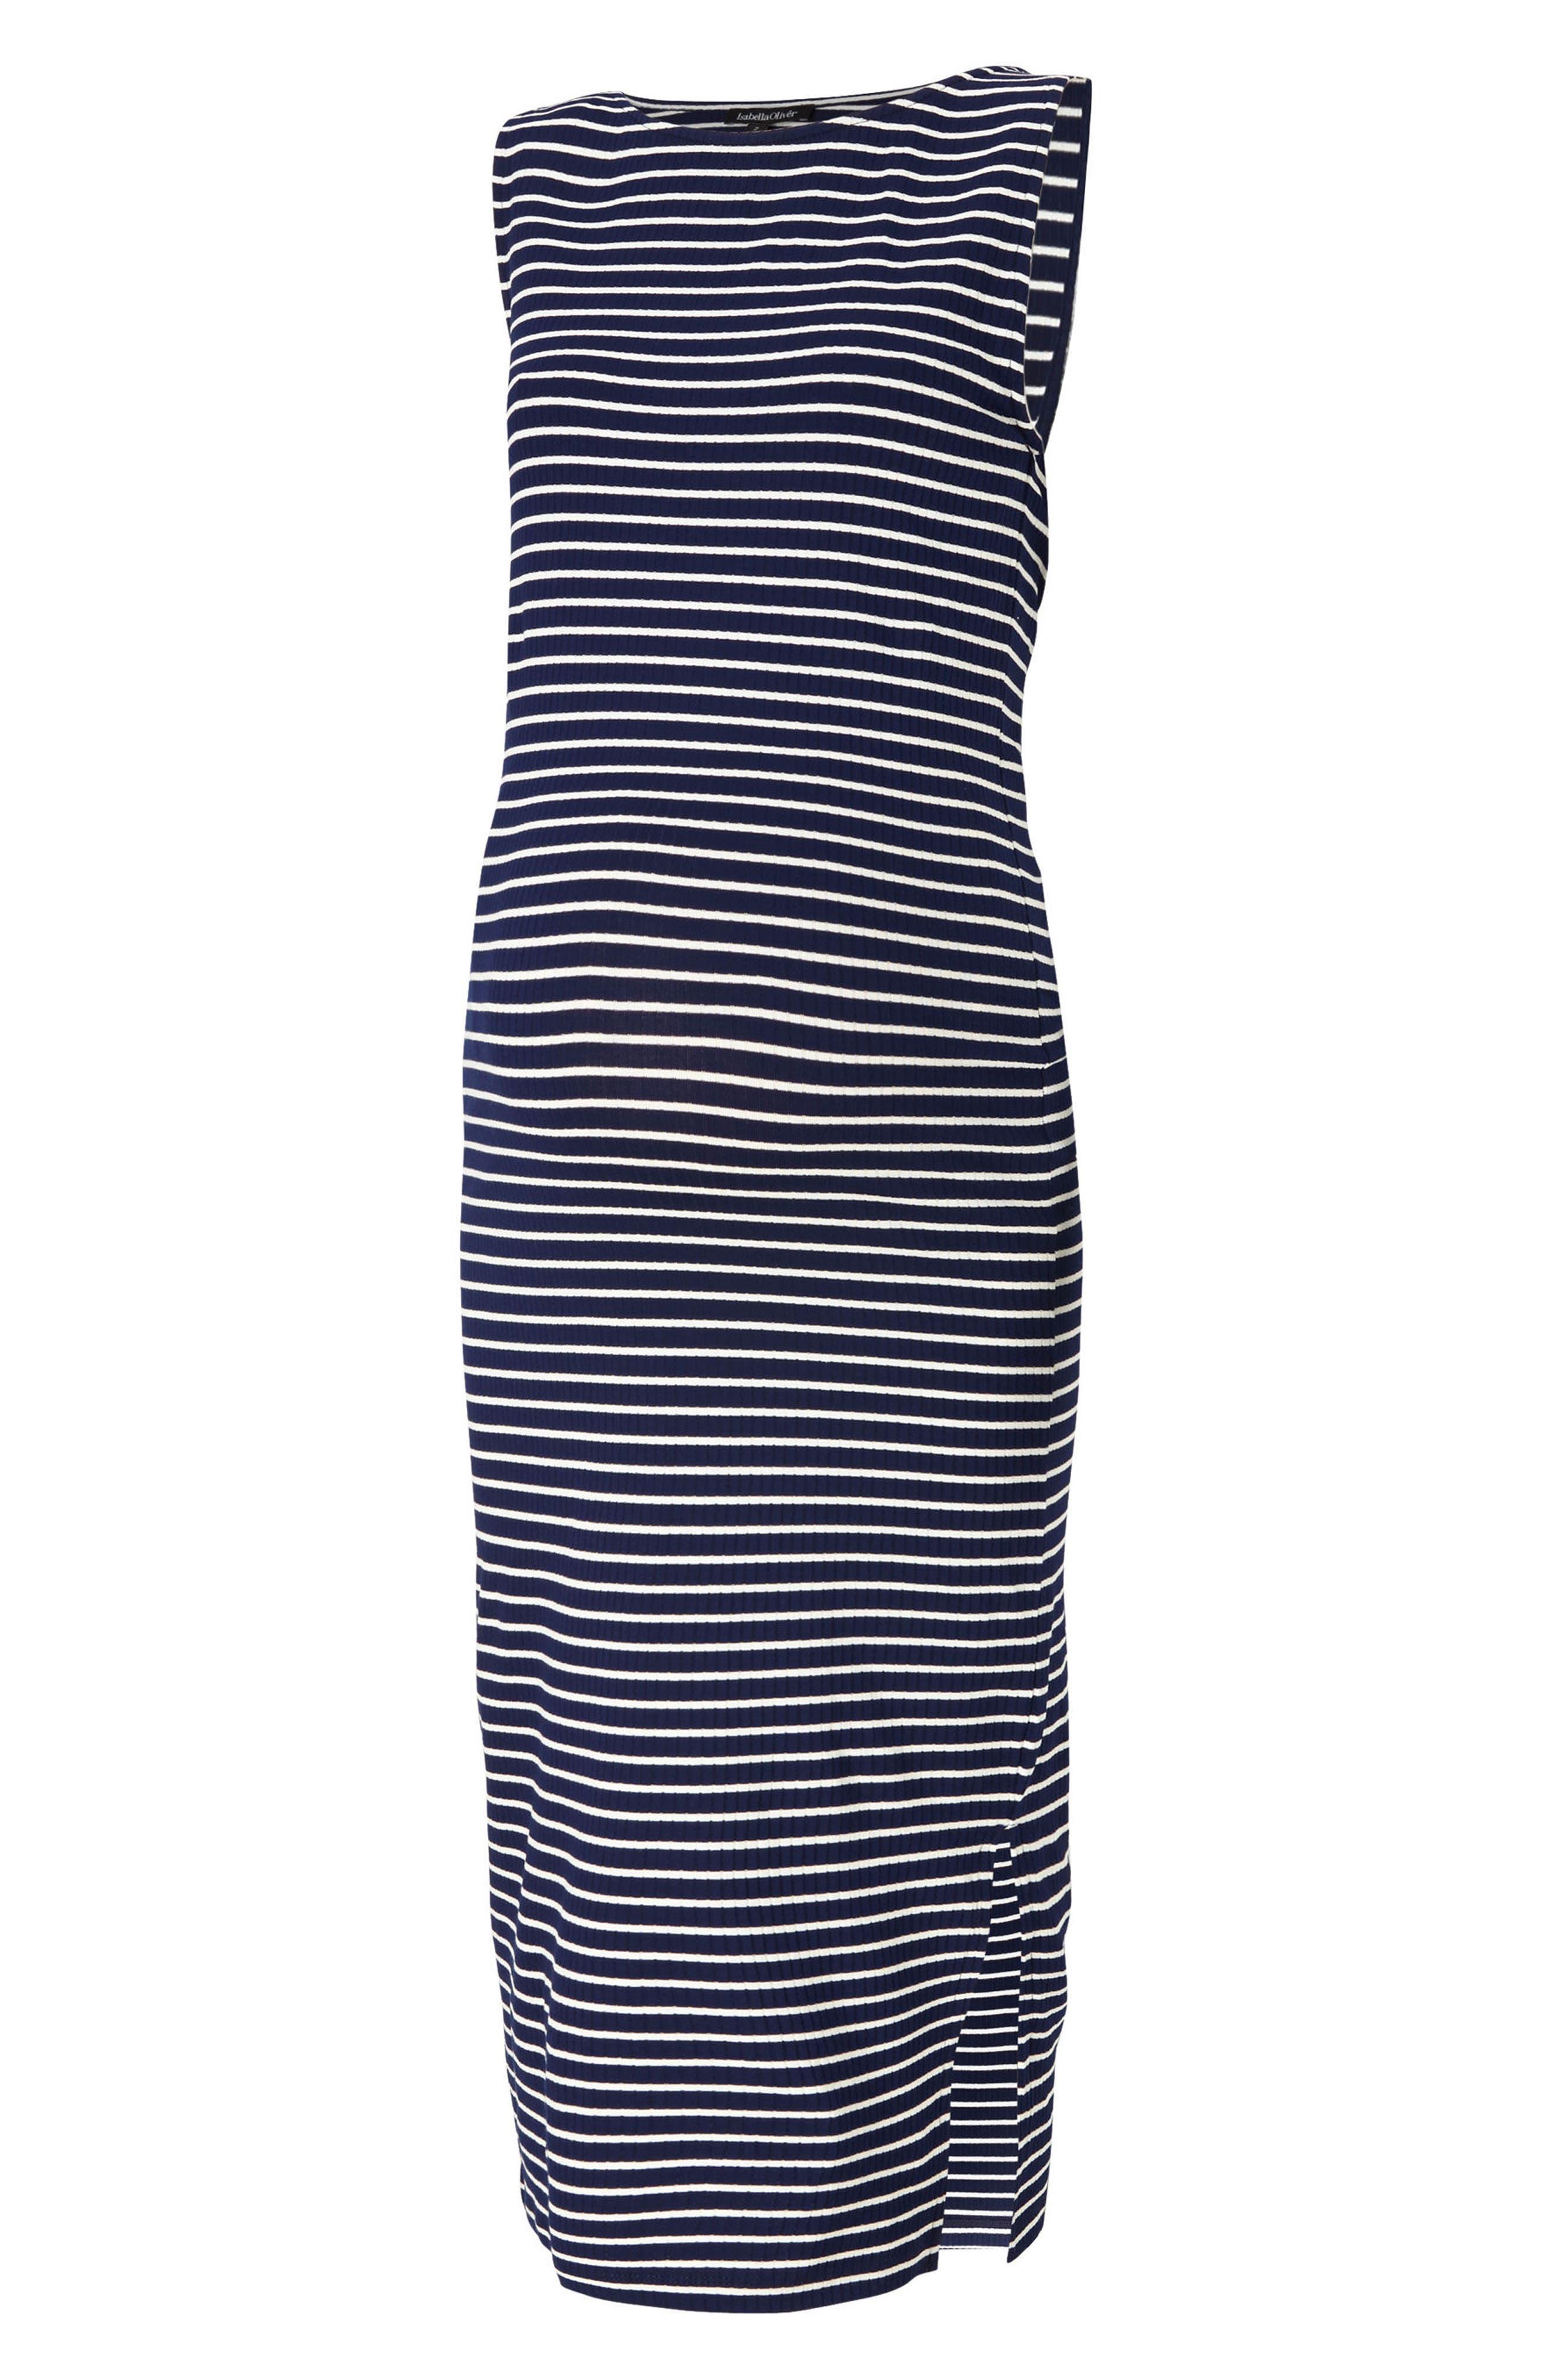 Katerina Ribbed Maternity Tank Dress,                             Main thumbnail 1, color,                             Navy/ White Rib